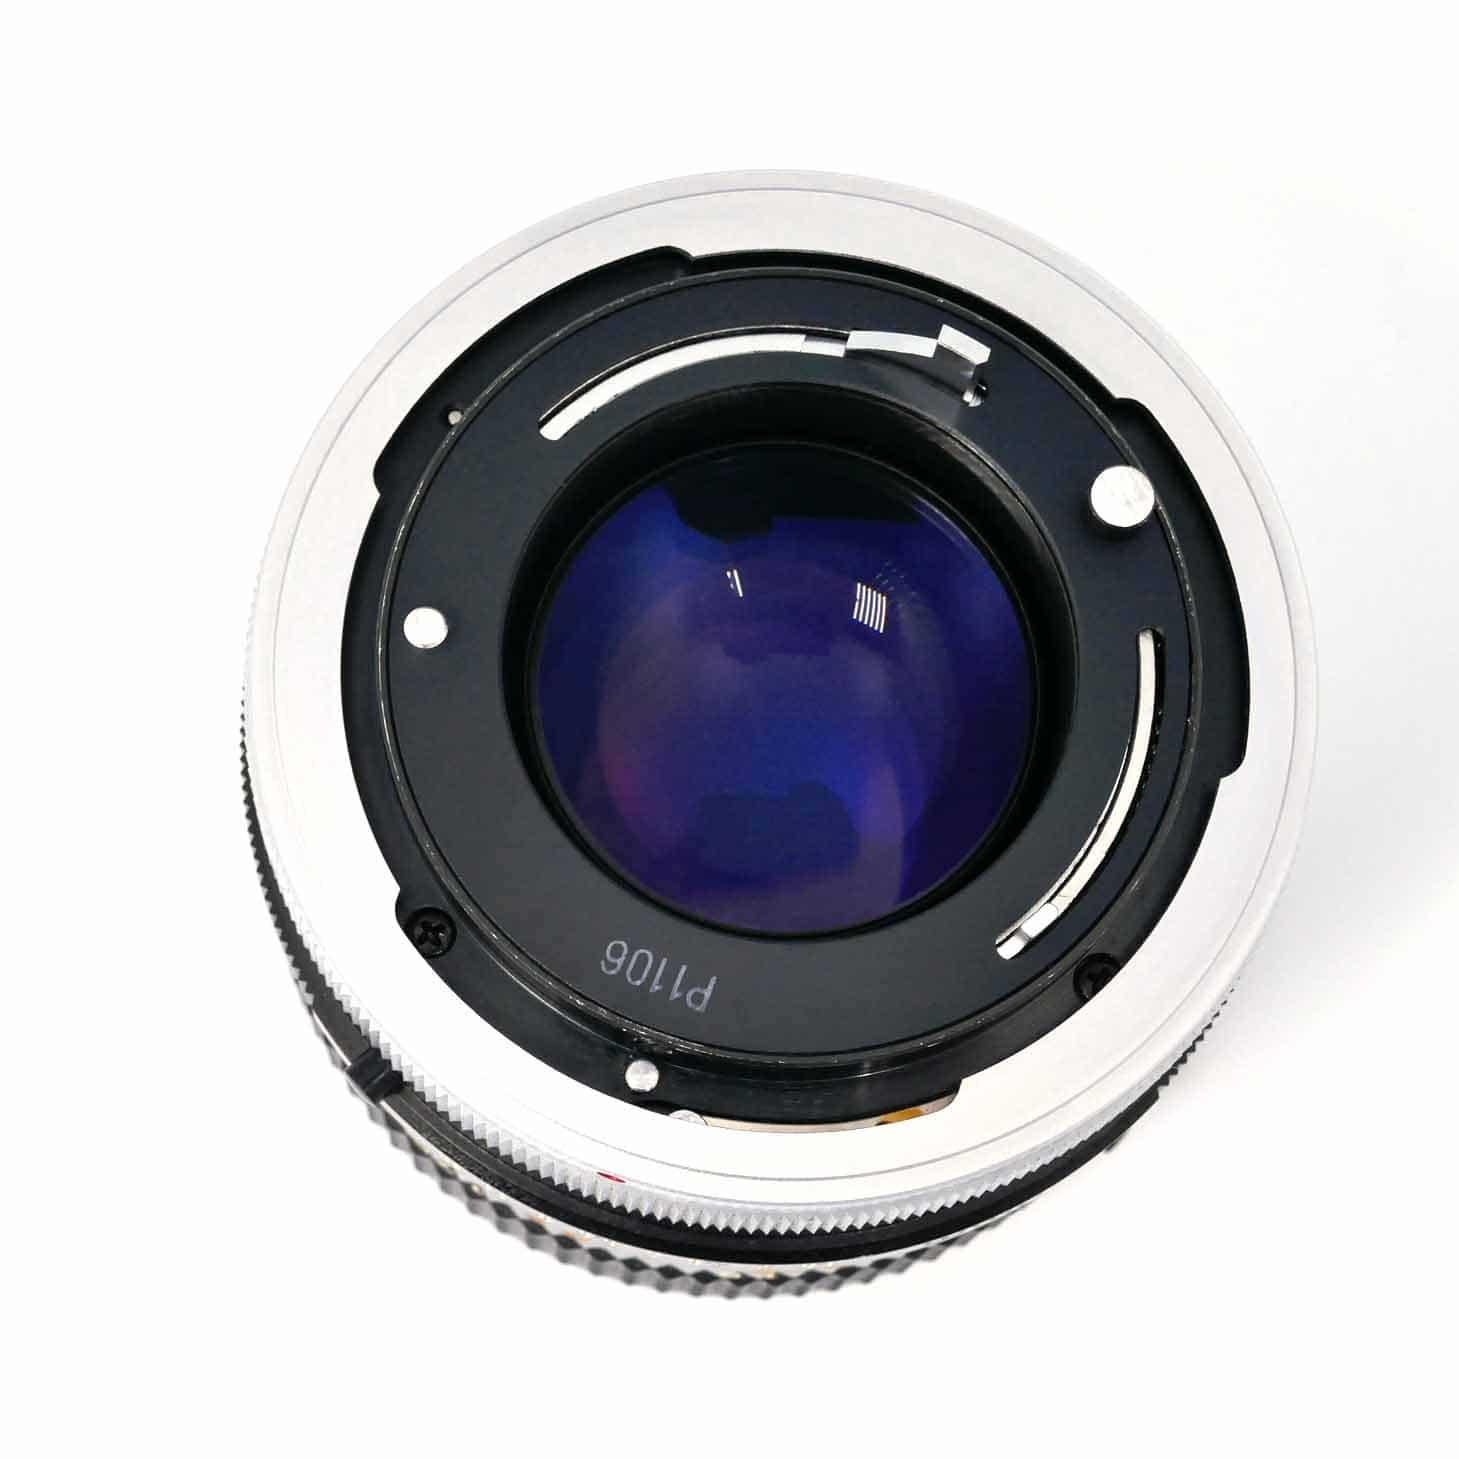 clean-cameras-Canon-FD-50mm-1.4-s.s.c-05